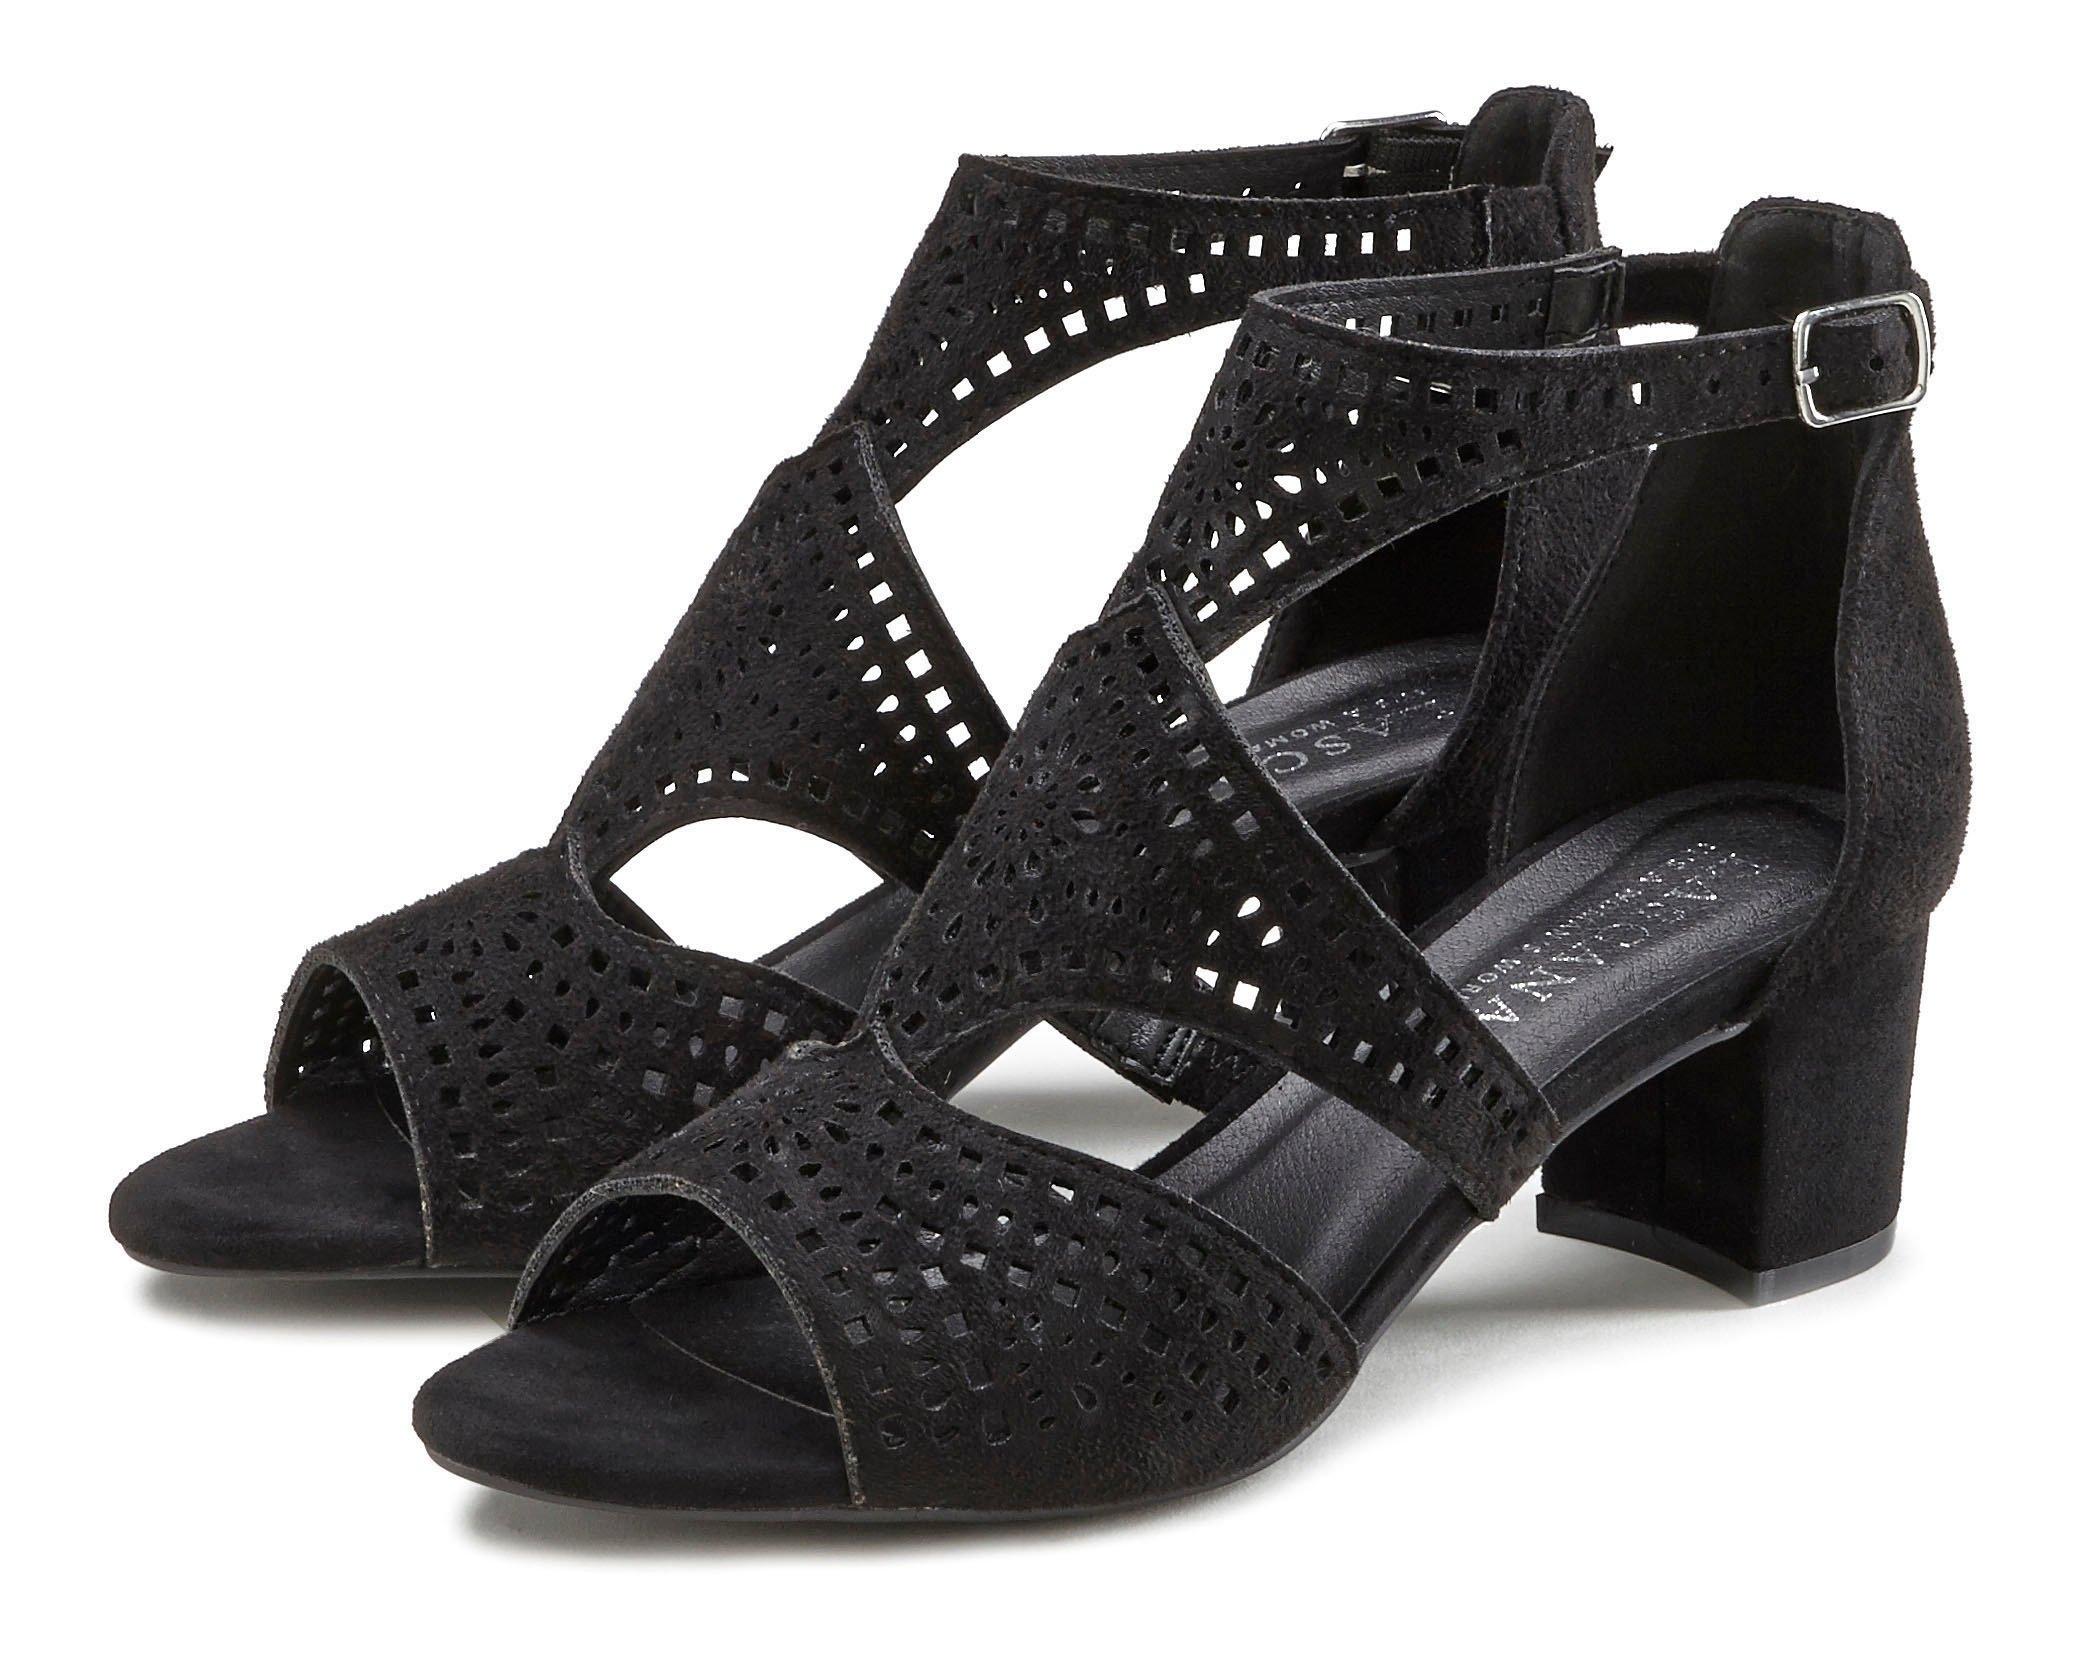 LASCANA sandaaltjes veilig op lascana.nl kopen